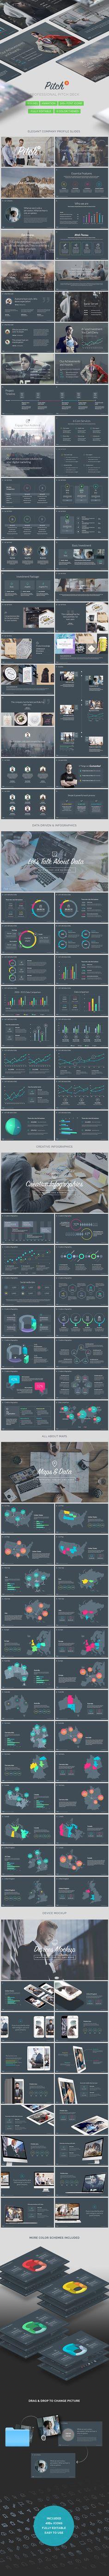 Pitch 3  Professional Pitch Deck Keynote Template — Keynote KEY #social media #tech • Download ➝ https://graphicriver.net/item/pitch-3-professional-pitch-deck-keynote-template/20321974?ref=pxcr